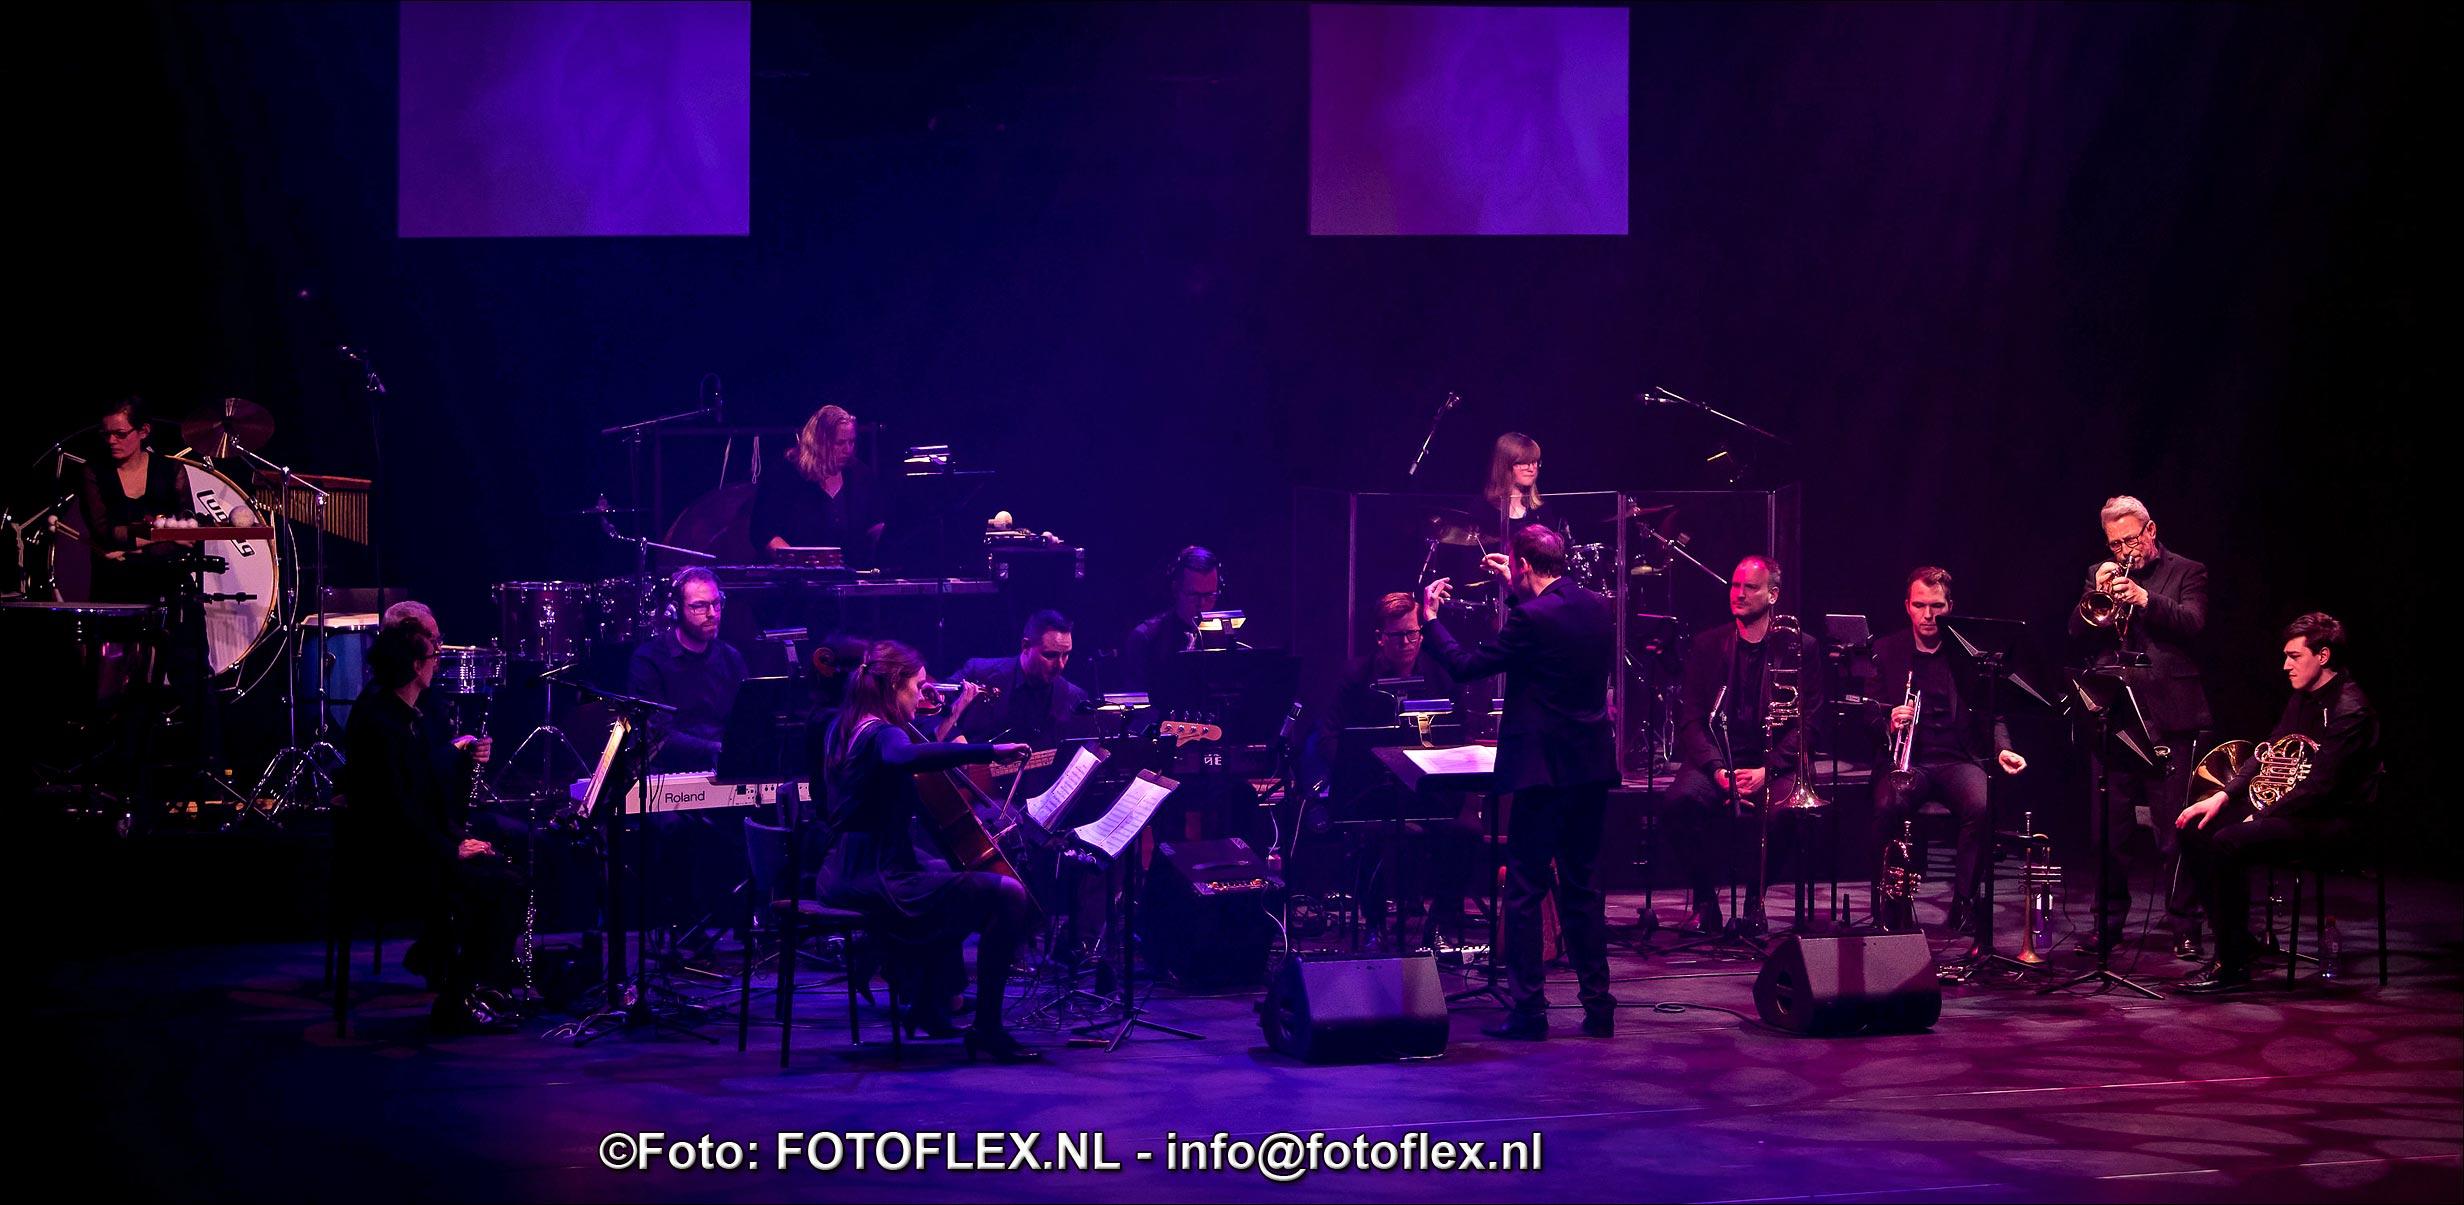 0504-CopyrightFOTOFLEX.NL07012020